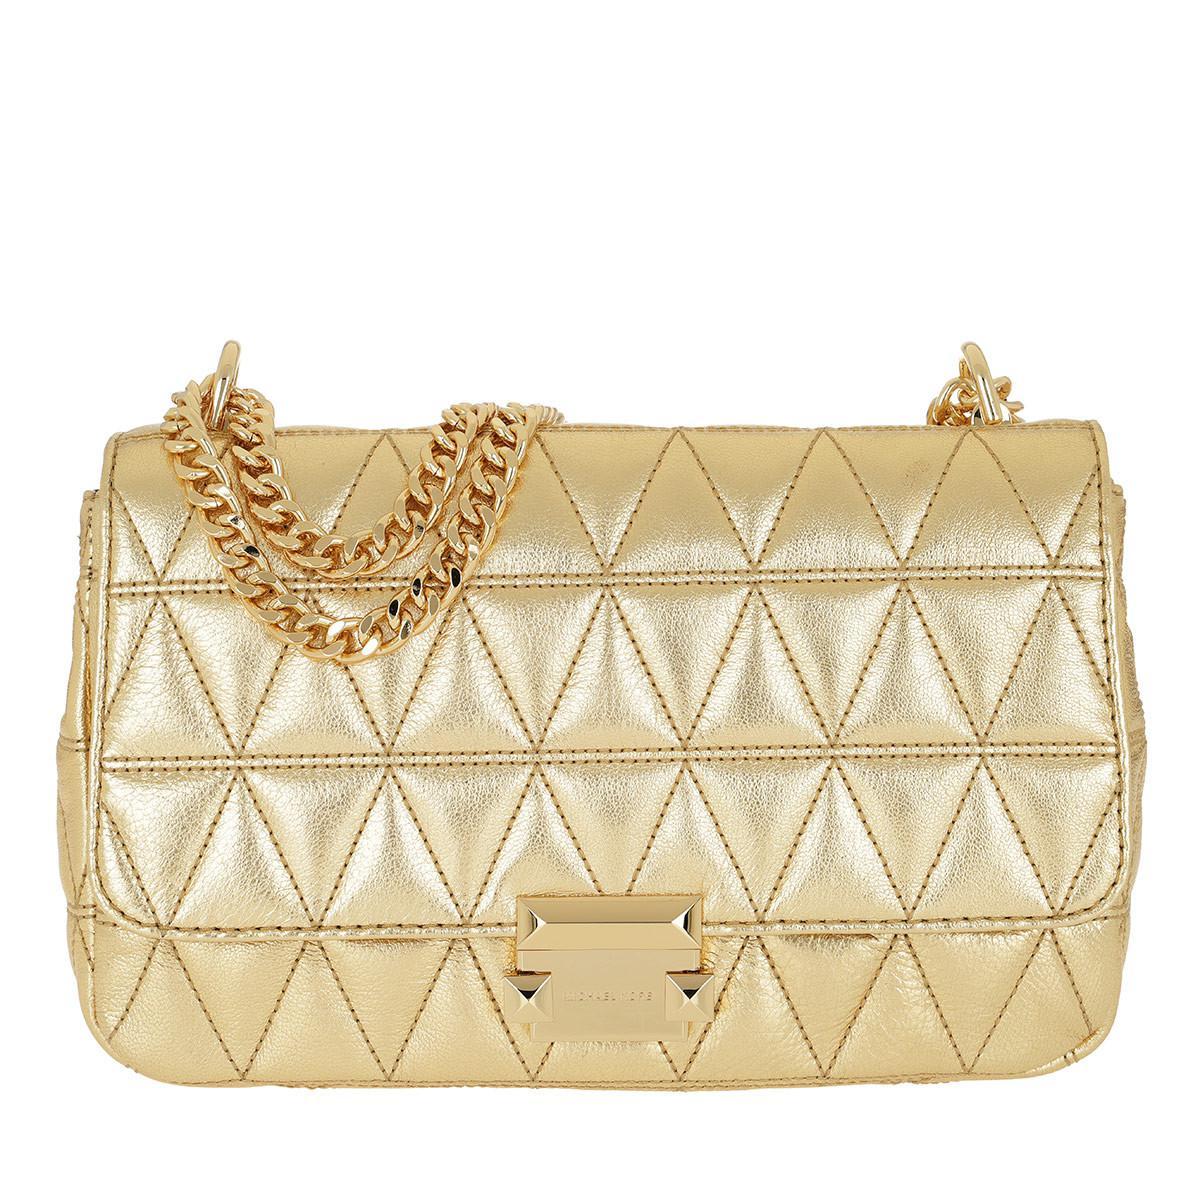 ddeb2590a806 ... france michael kors. womens metallic sloan lg chain shoulder bag old  gold 1b106 a3a30